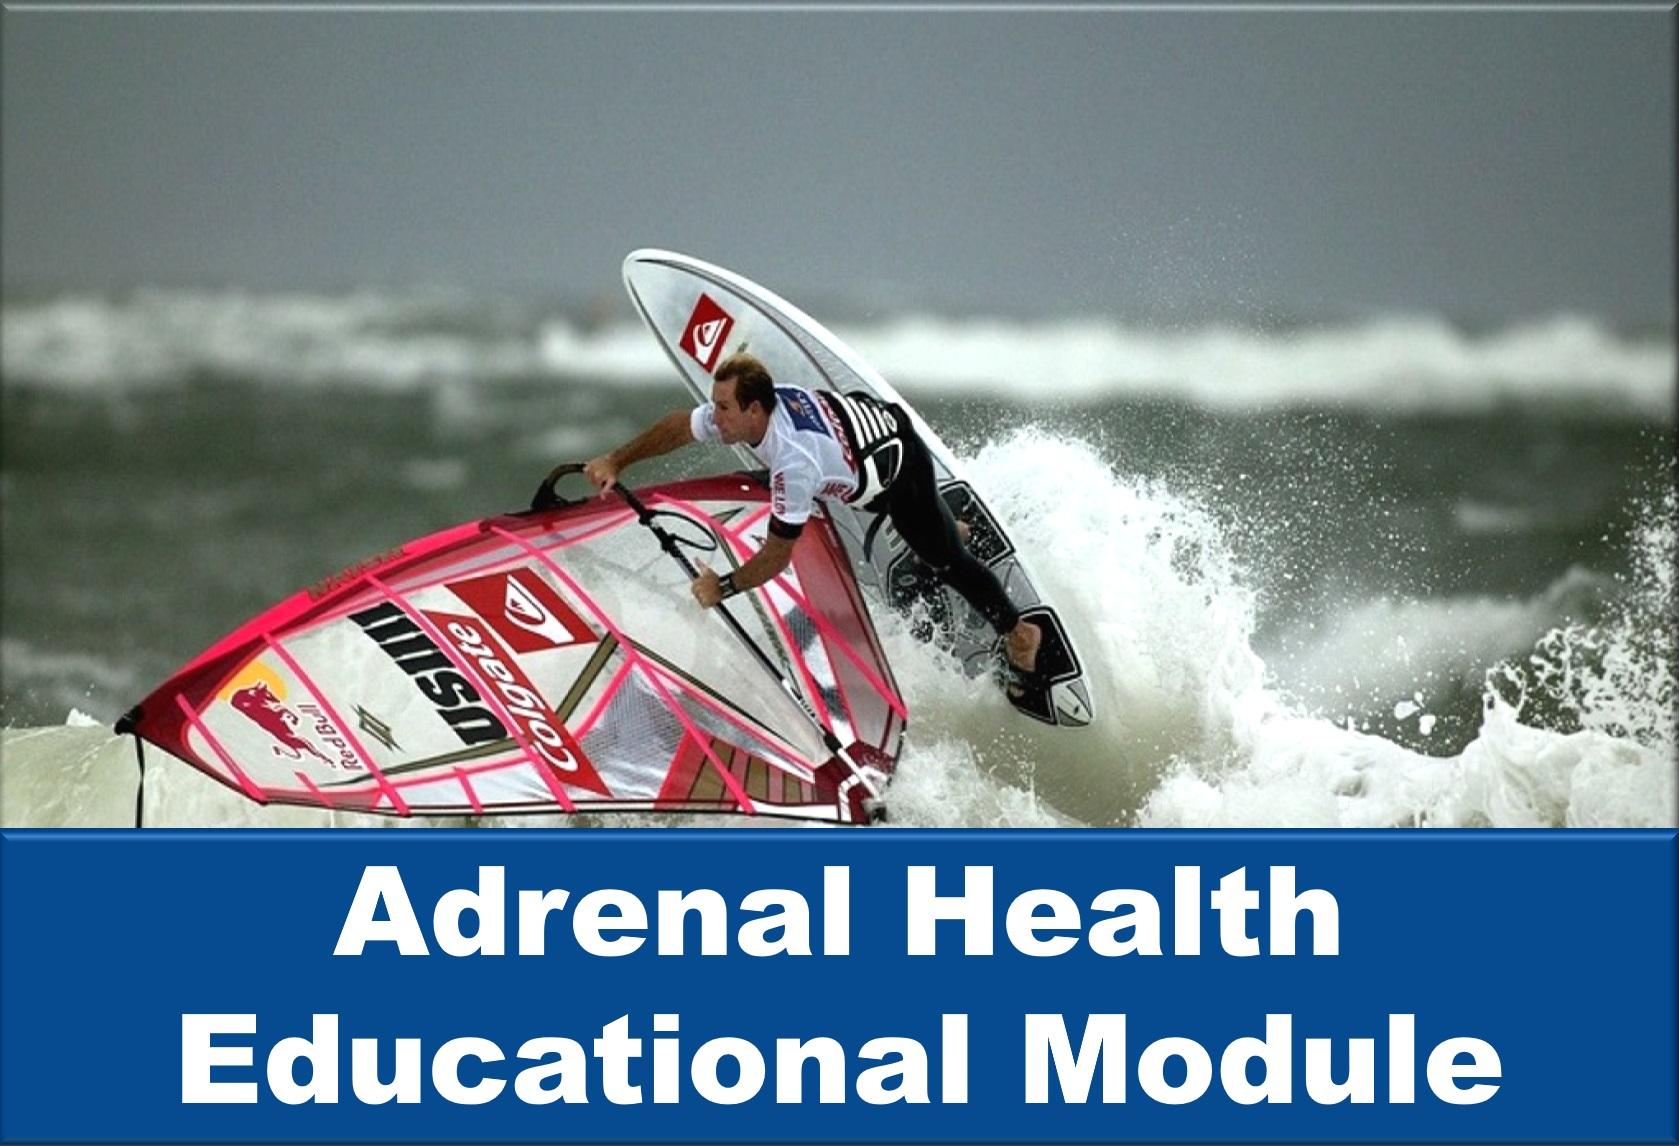 Adrenal Health Educational Module